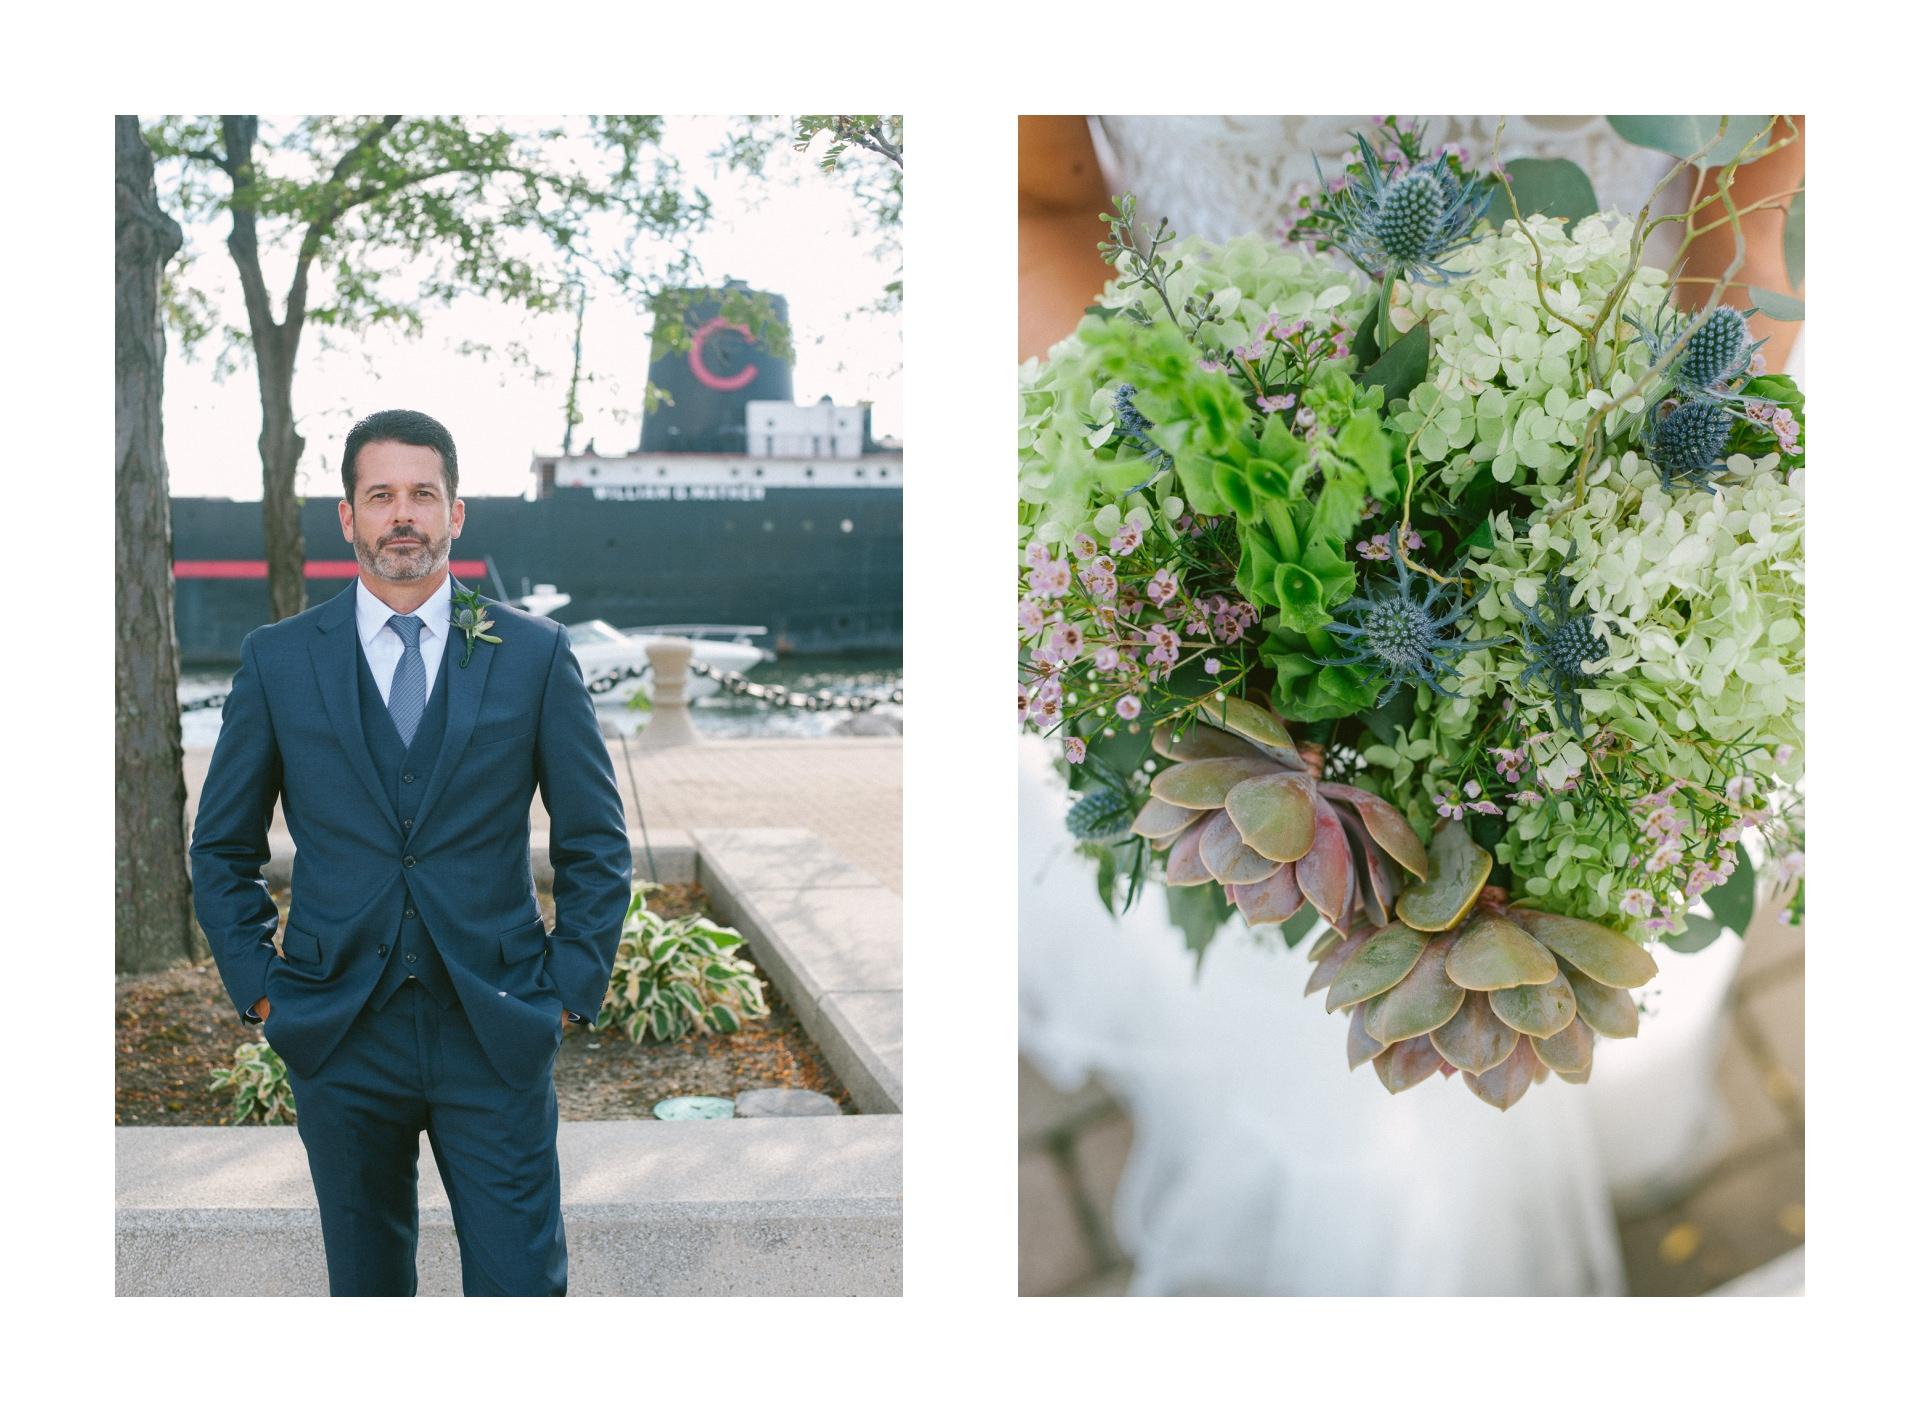 Nuevo Modern Mexican Wedding Photographer in Cleveland 1 37.jpg